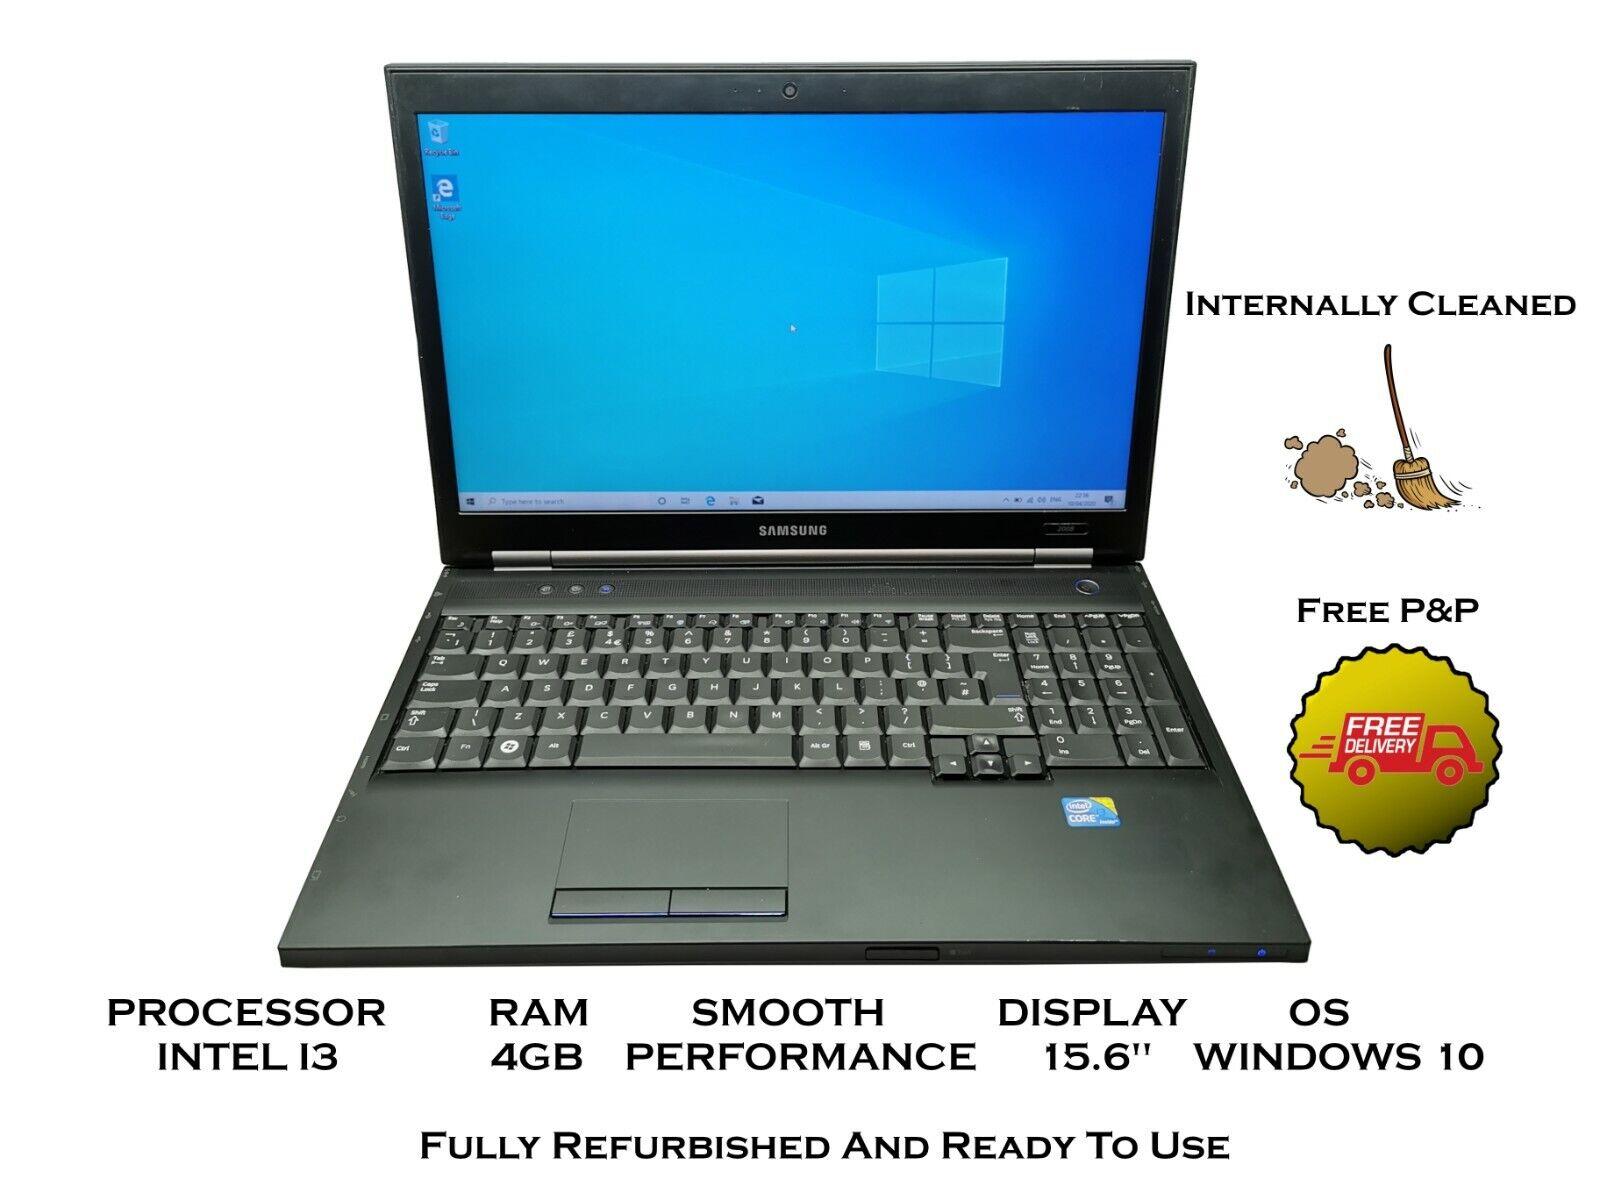 Laptop Windows - Samsung Laptop CHEAP and FAST - Intel i3 4GB RAM 500GB HDD Windows 10